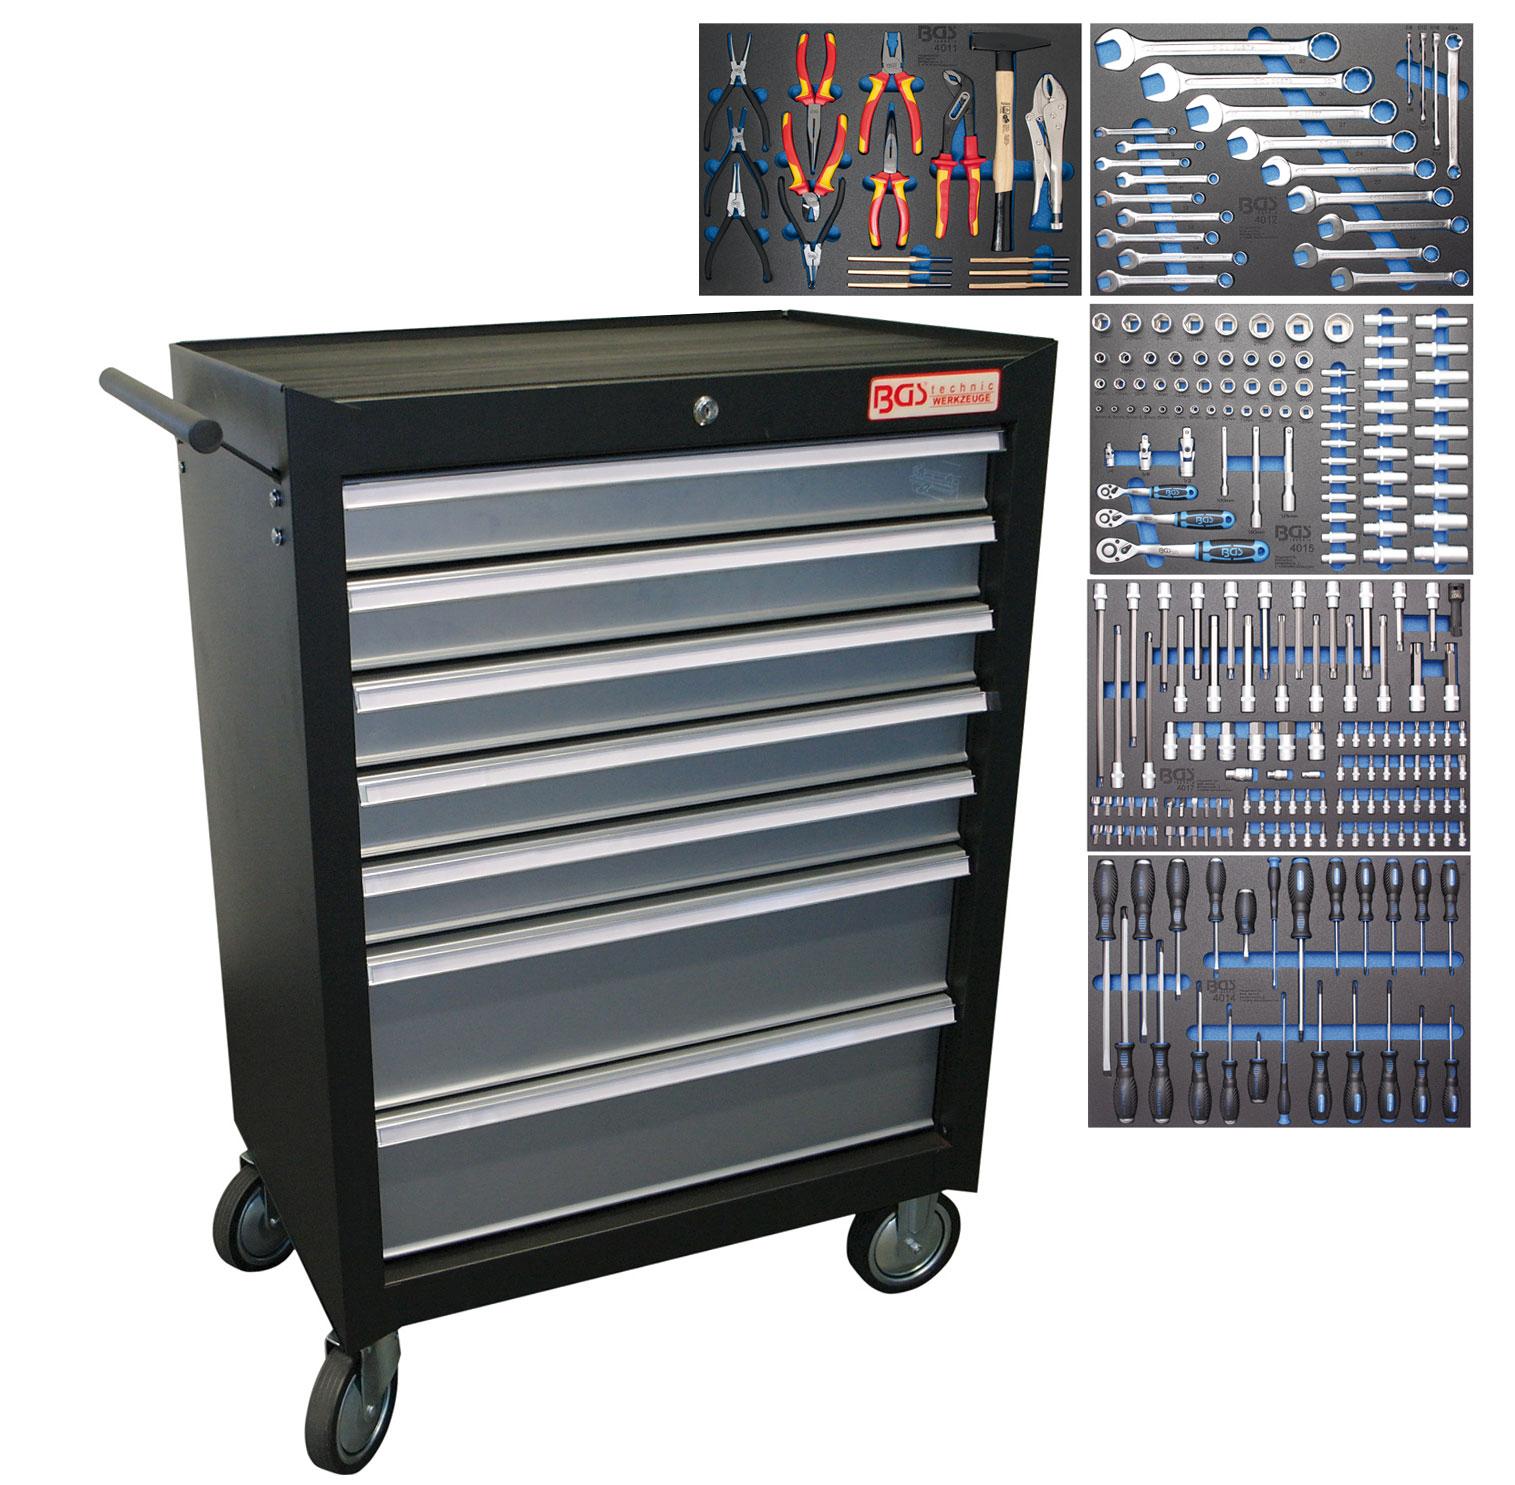 servante outillage complete 243 outils bgs oc pro fr. Black Bedroom Furniture Sets. Home Design Ideas